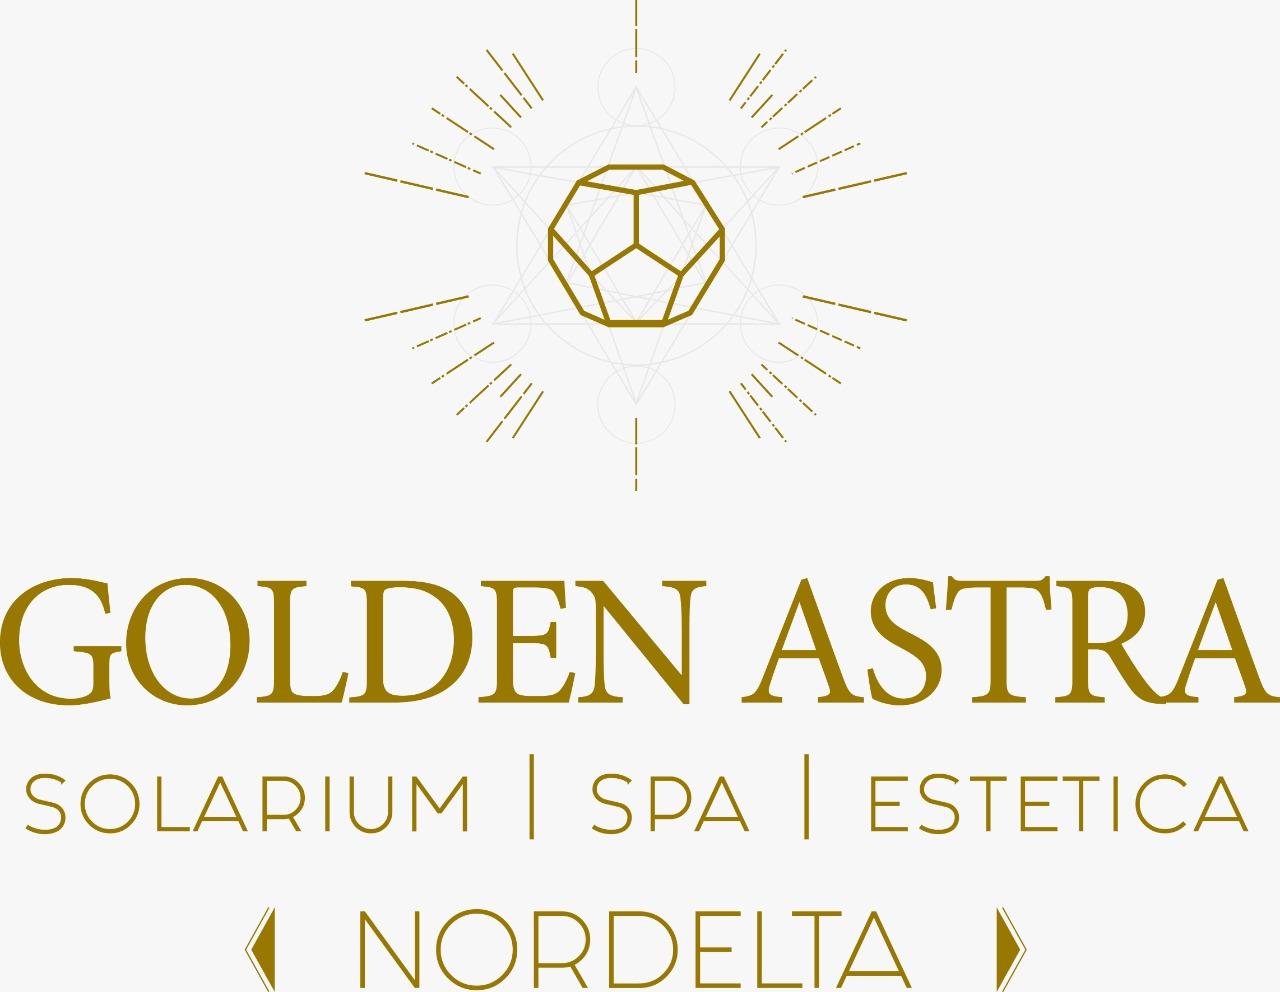 Golden Astra